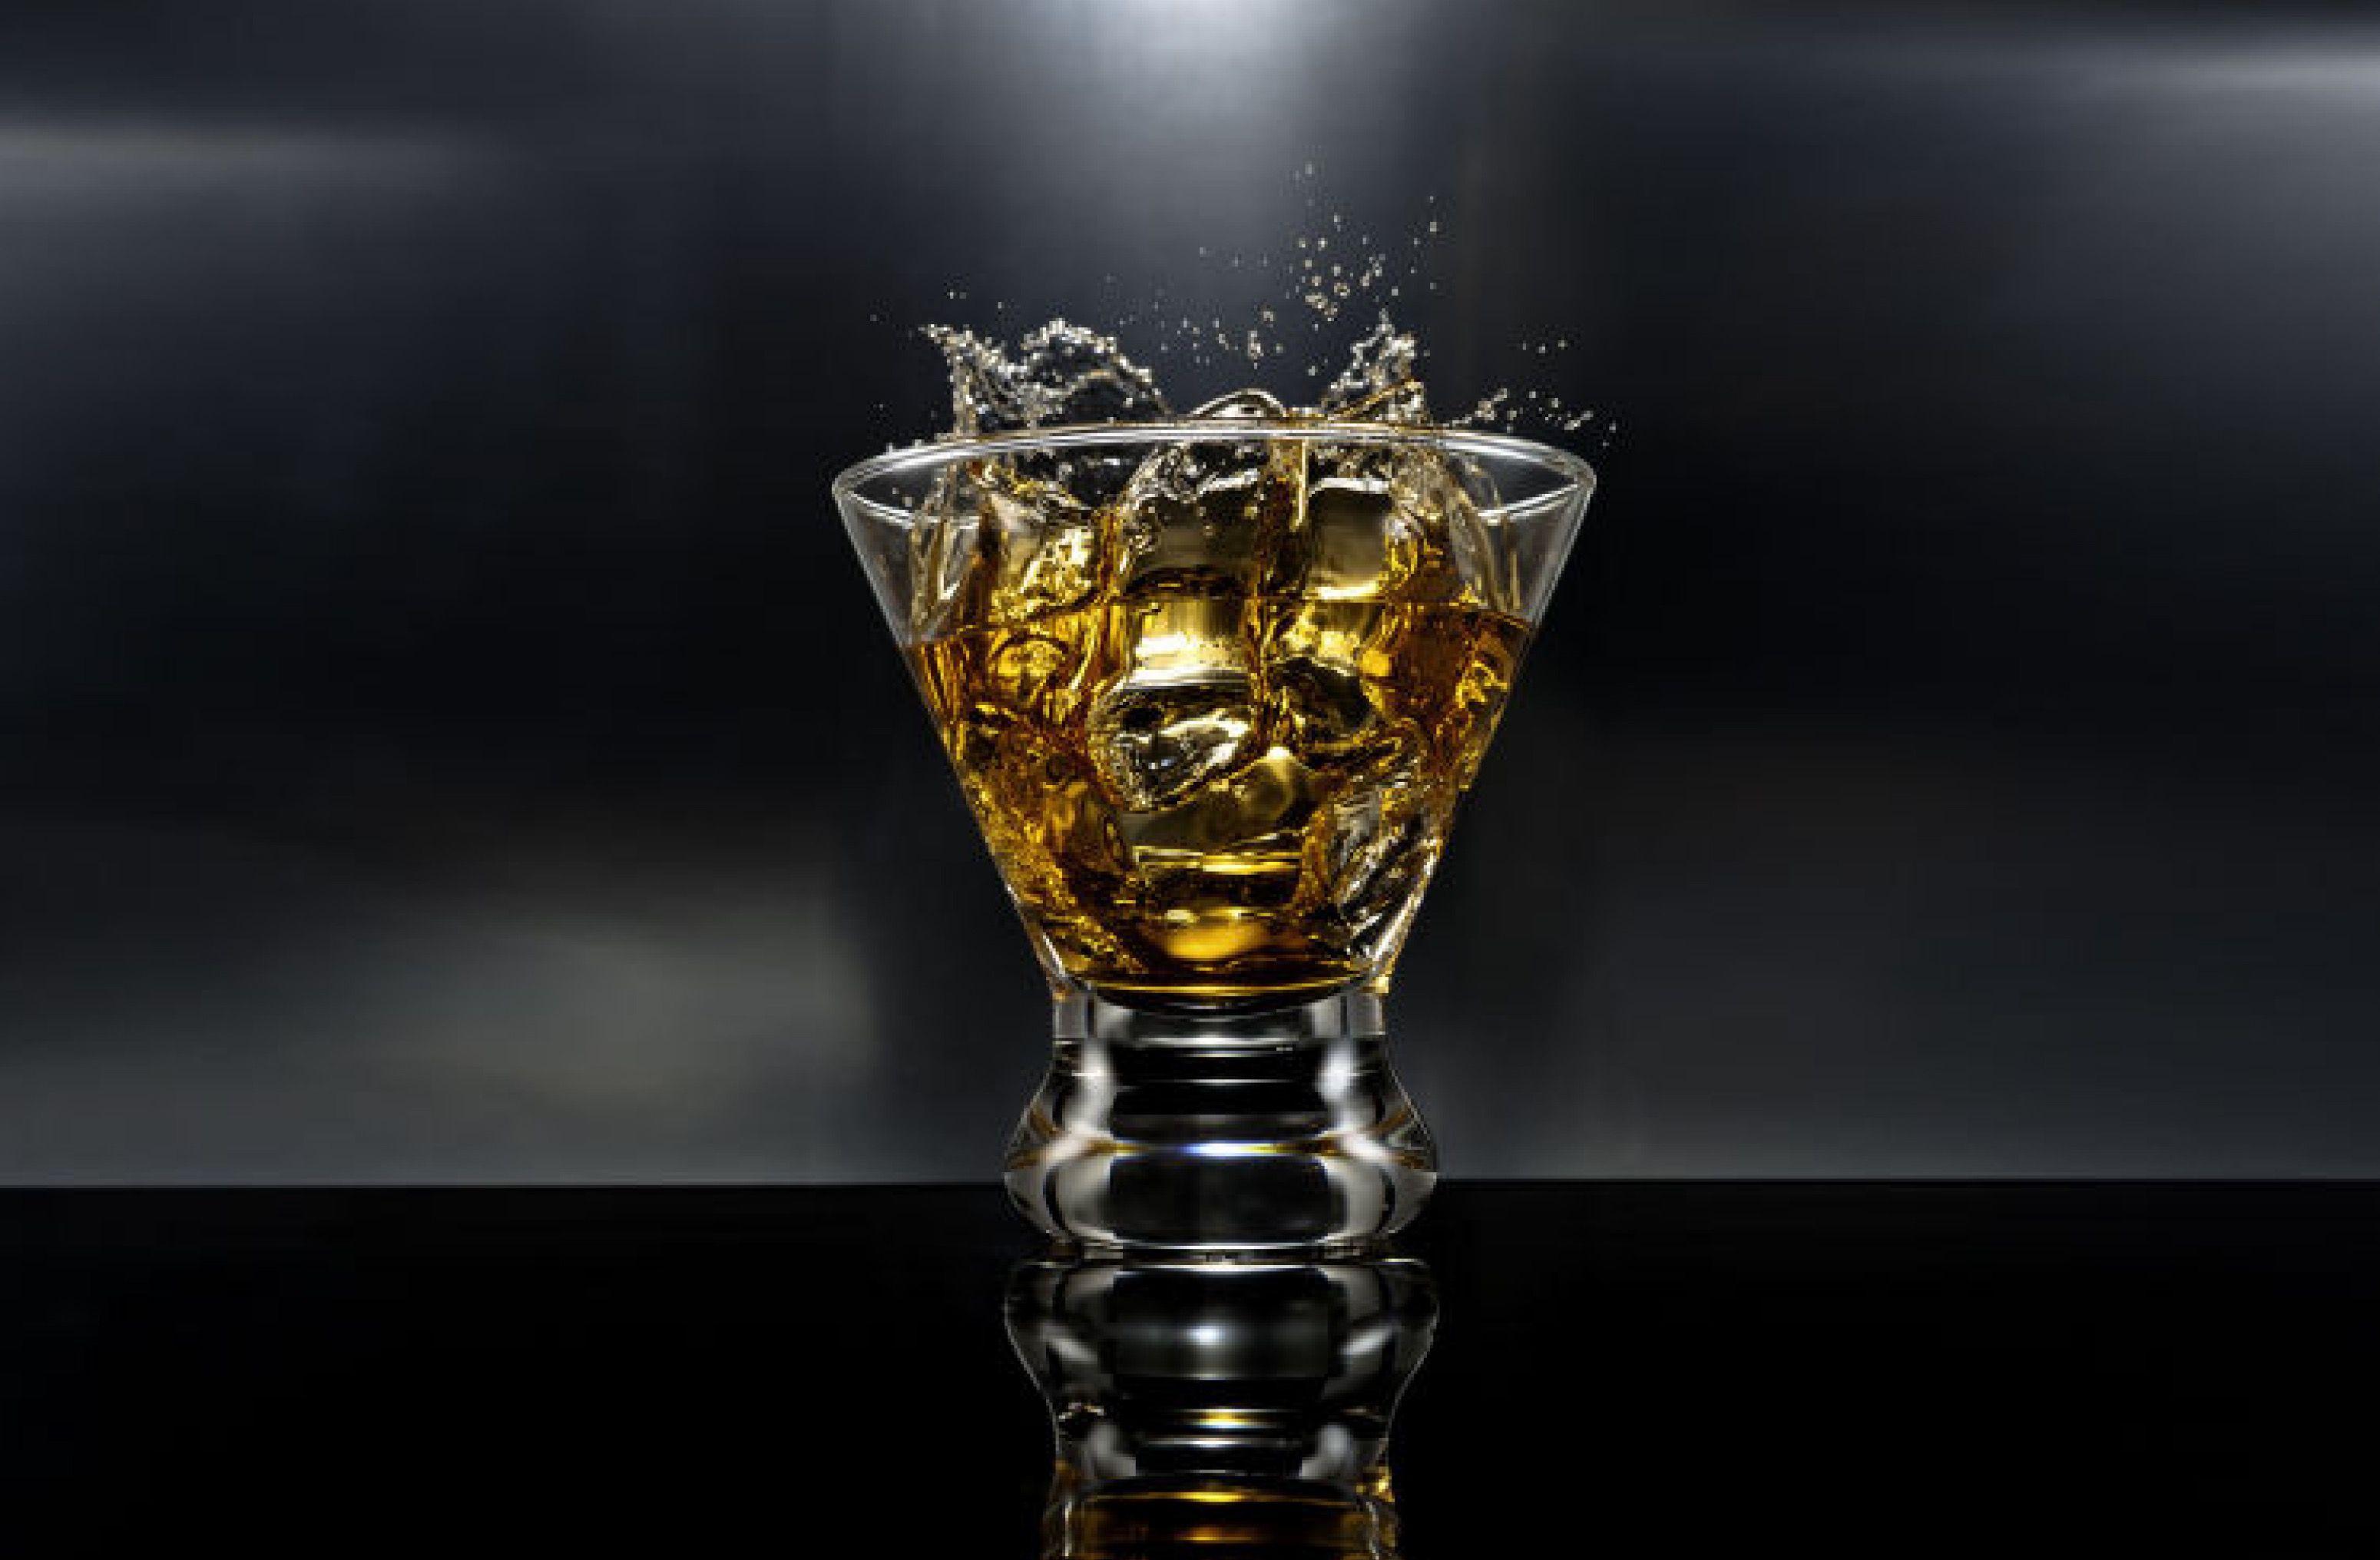 Alcohol_25.jpg